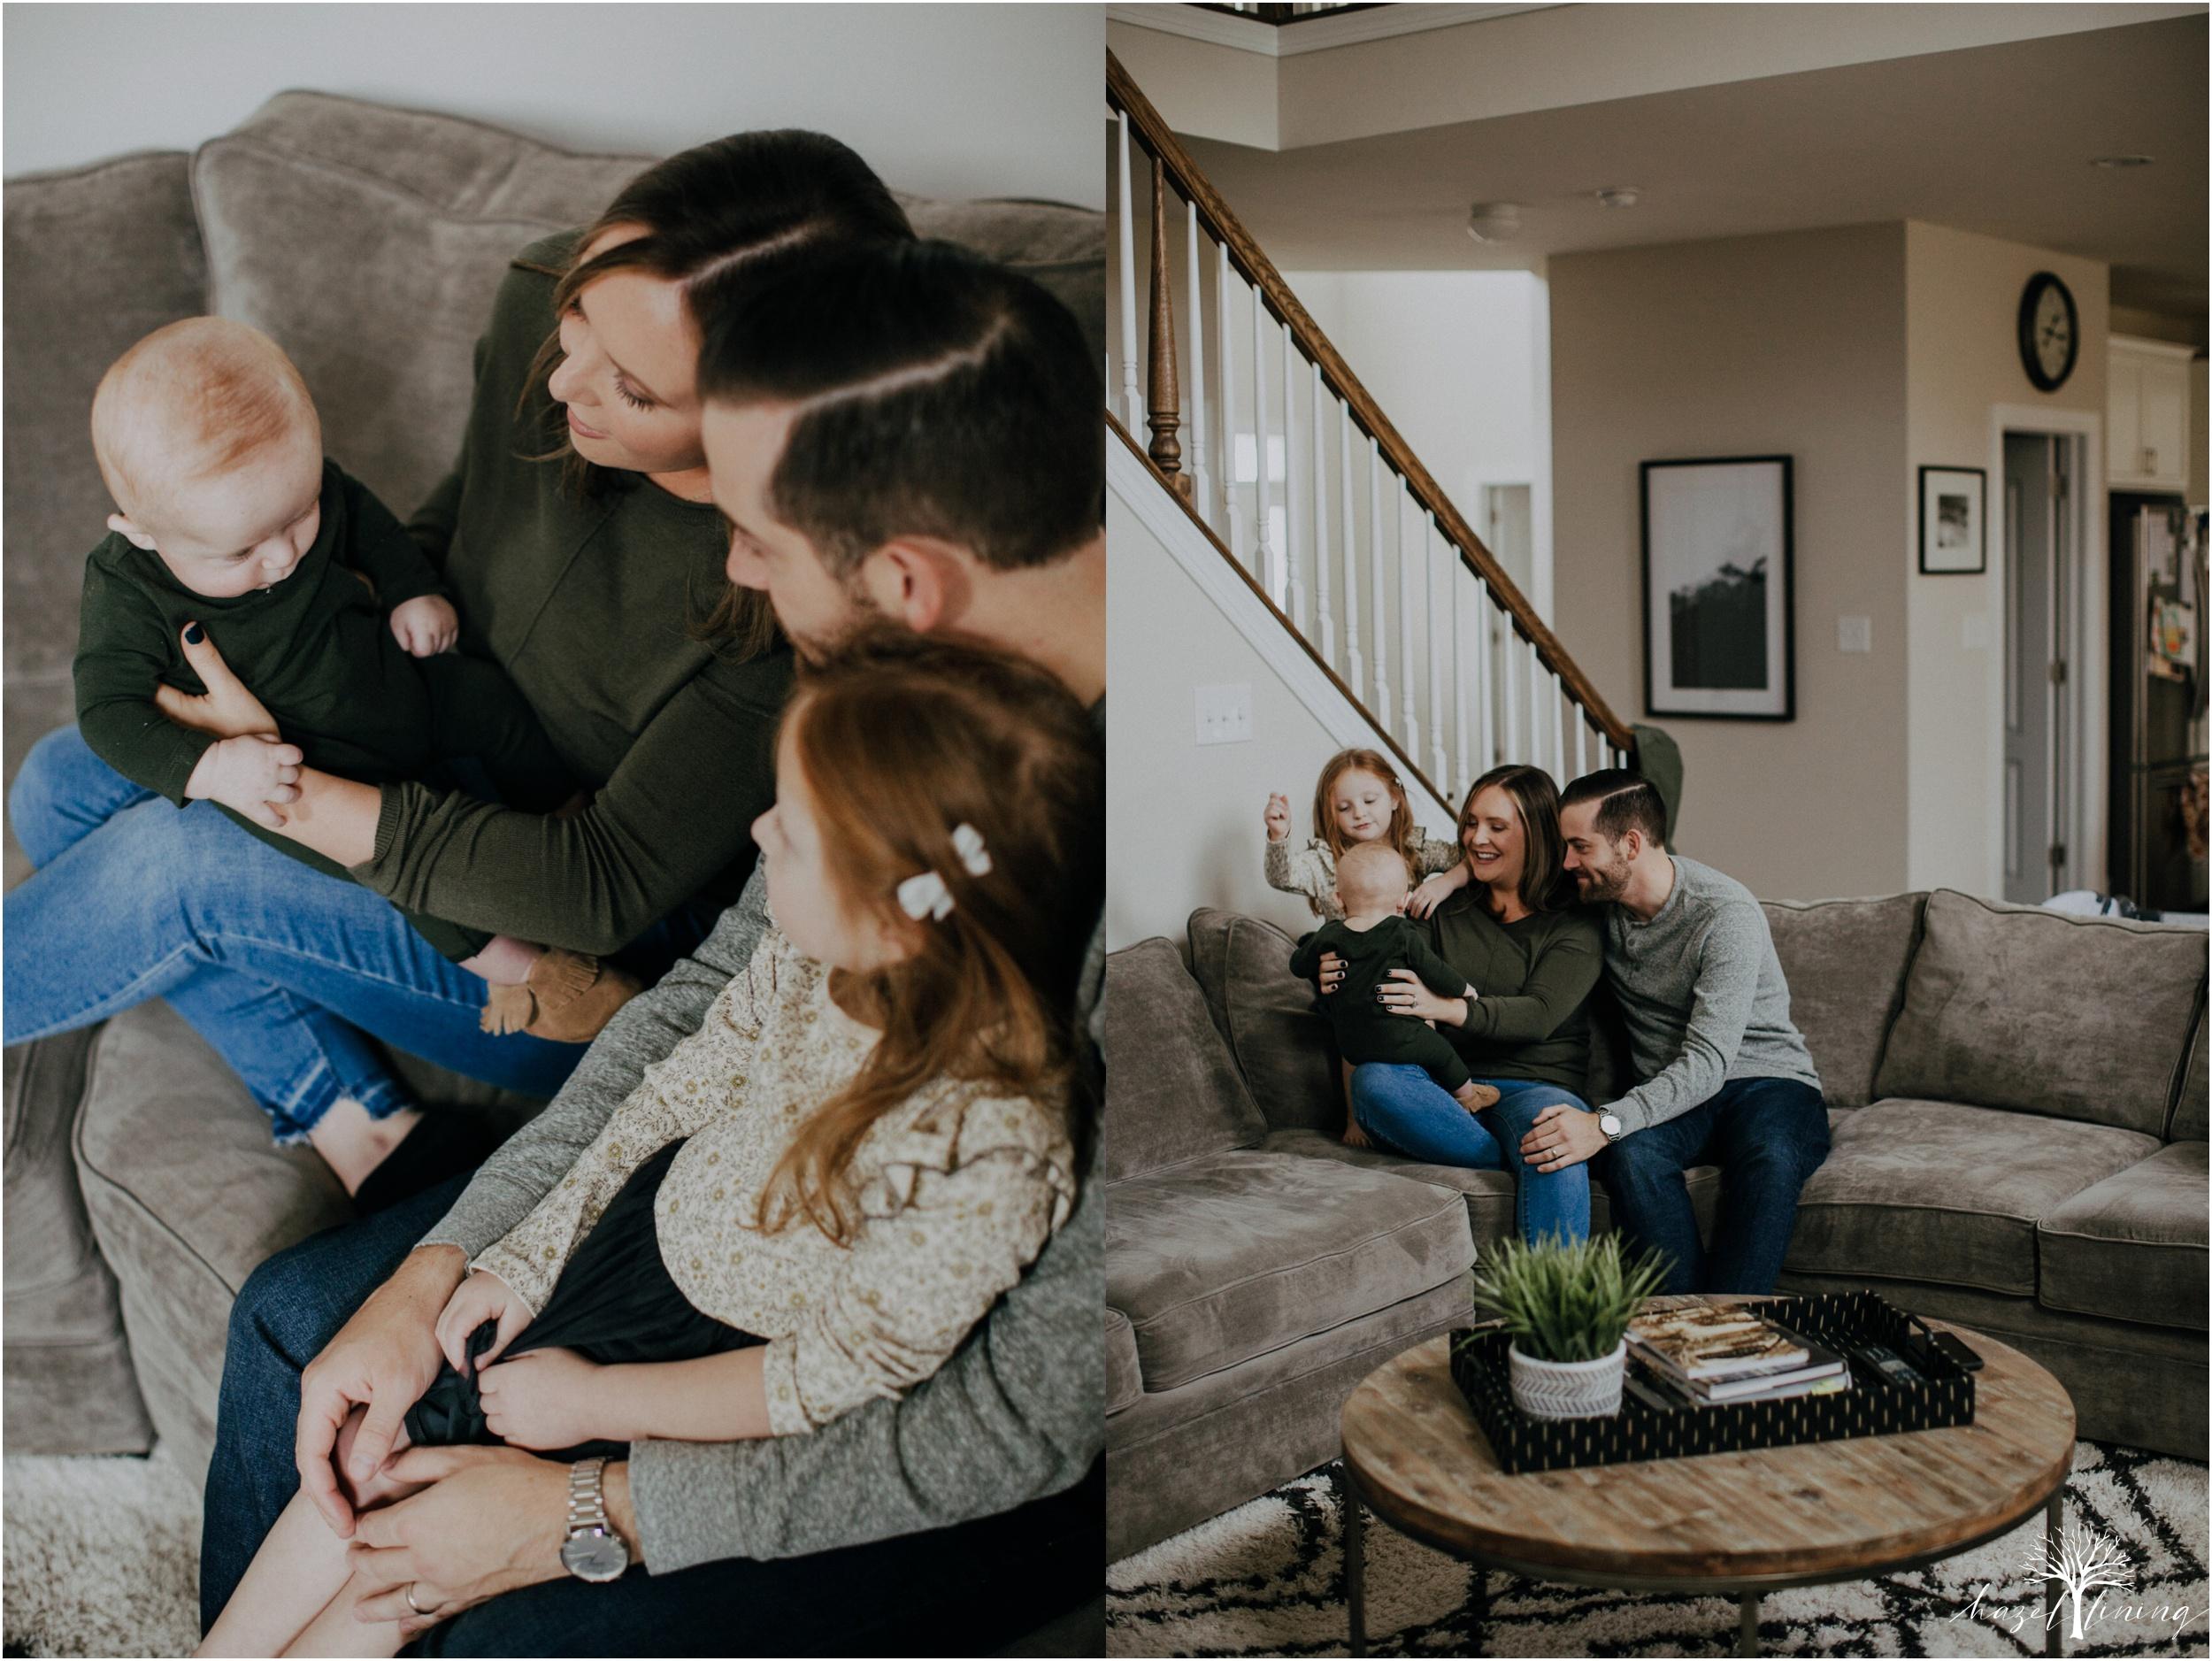 pellgrino-family-in-home-lifestyle-family-portraits_0038.jpg